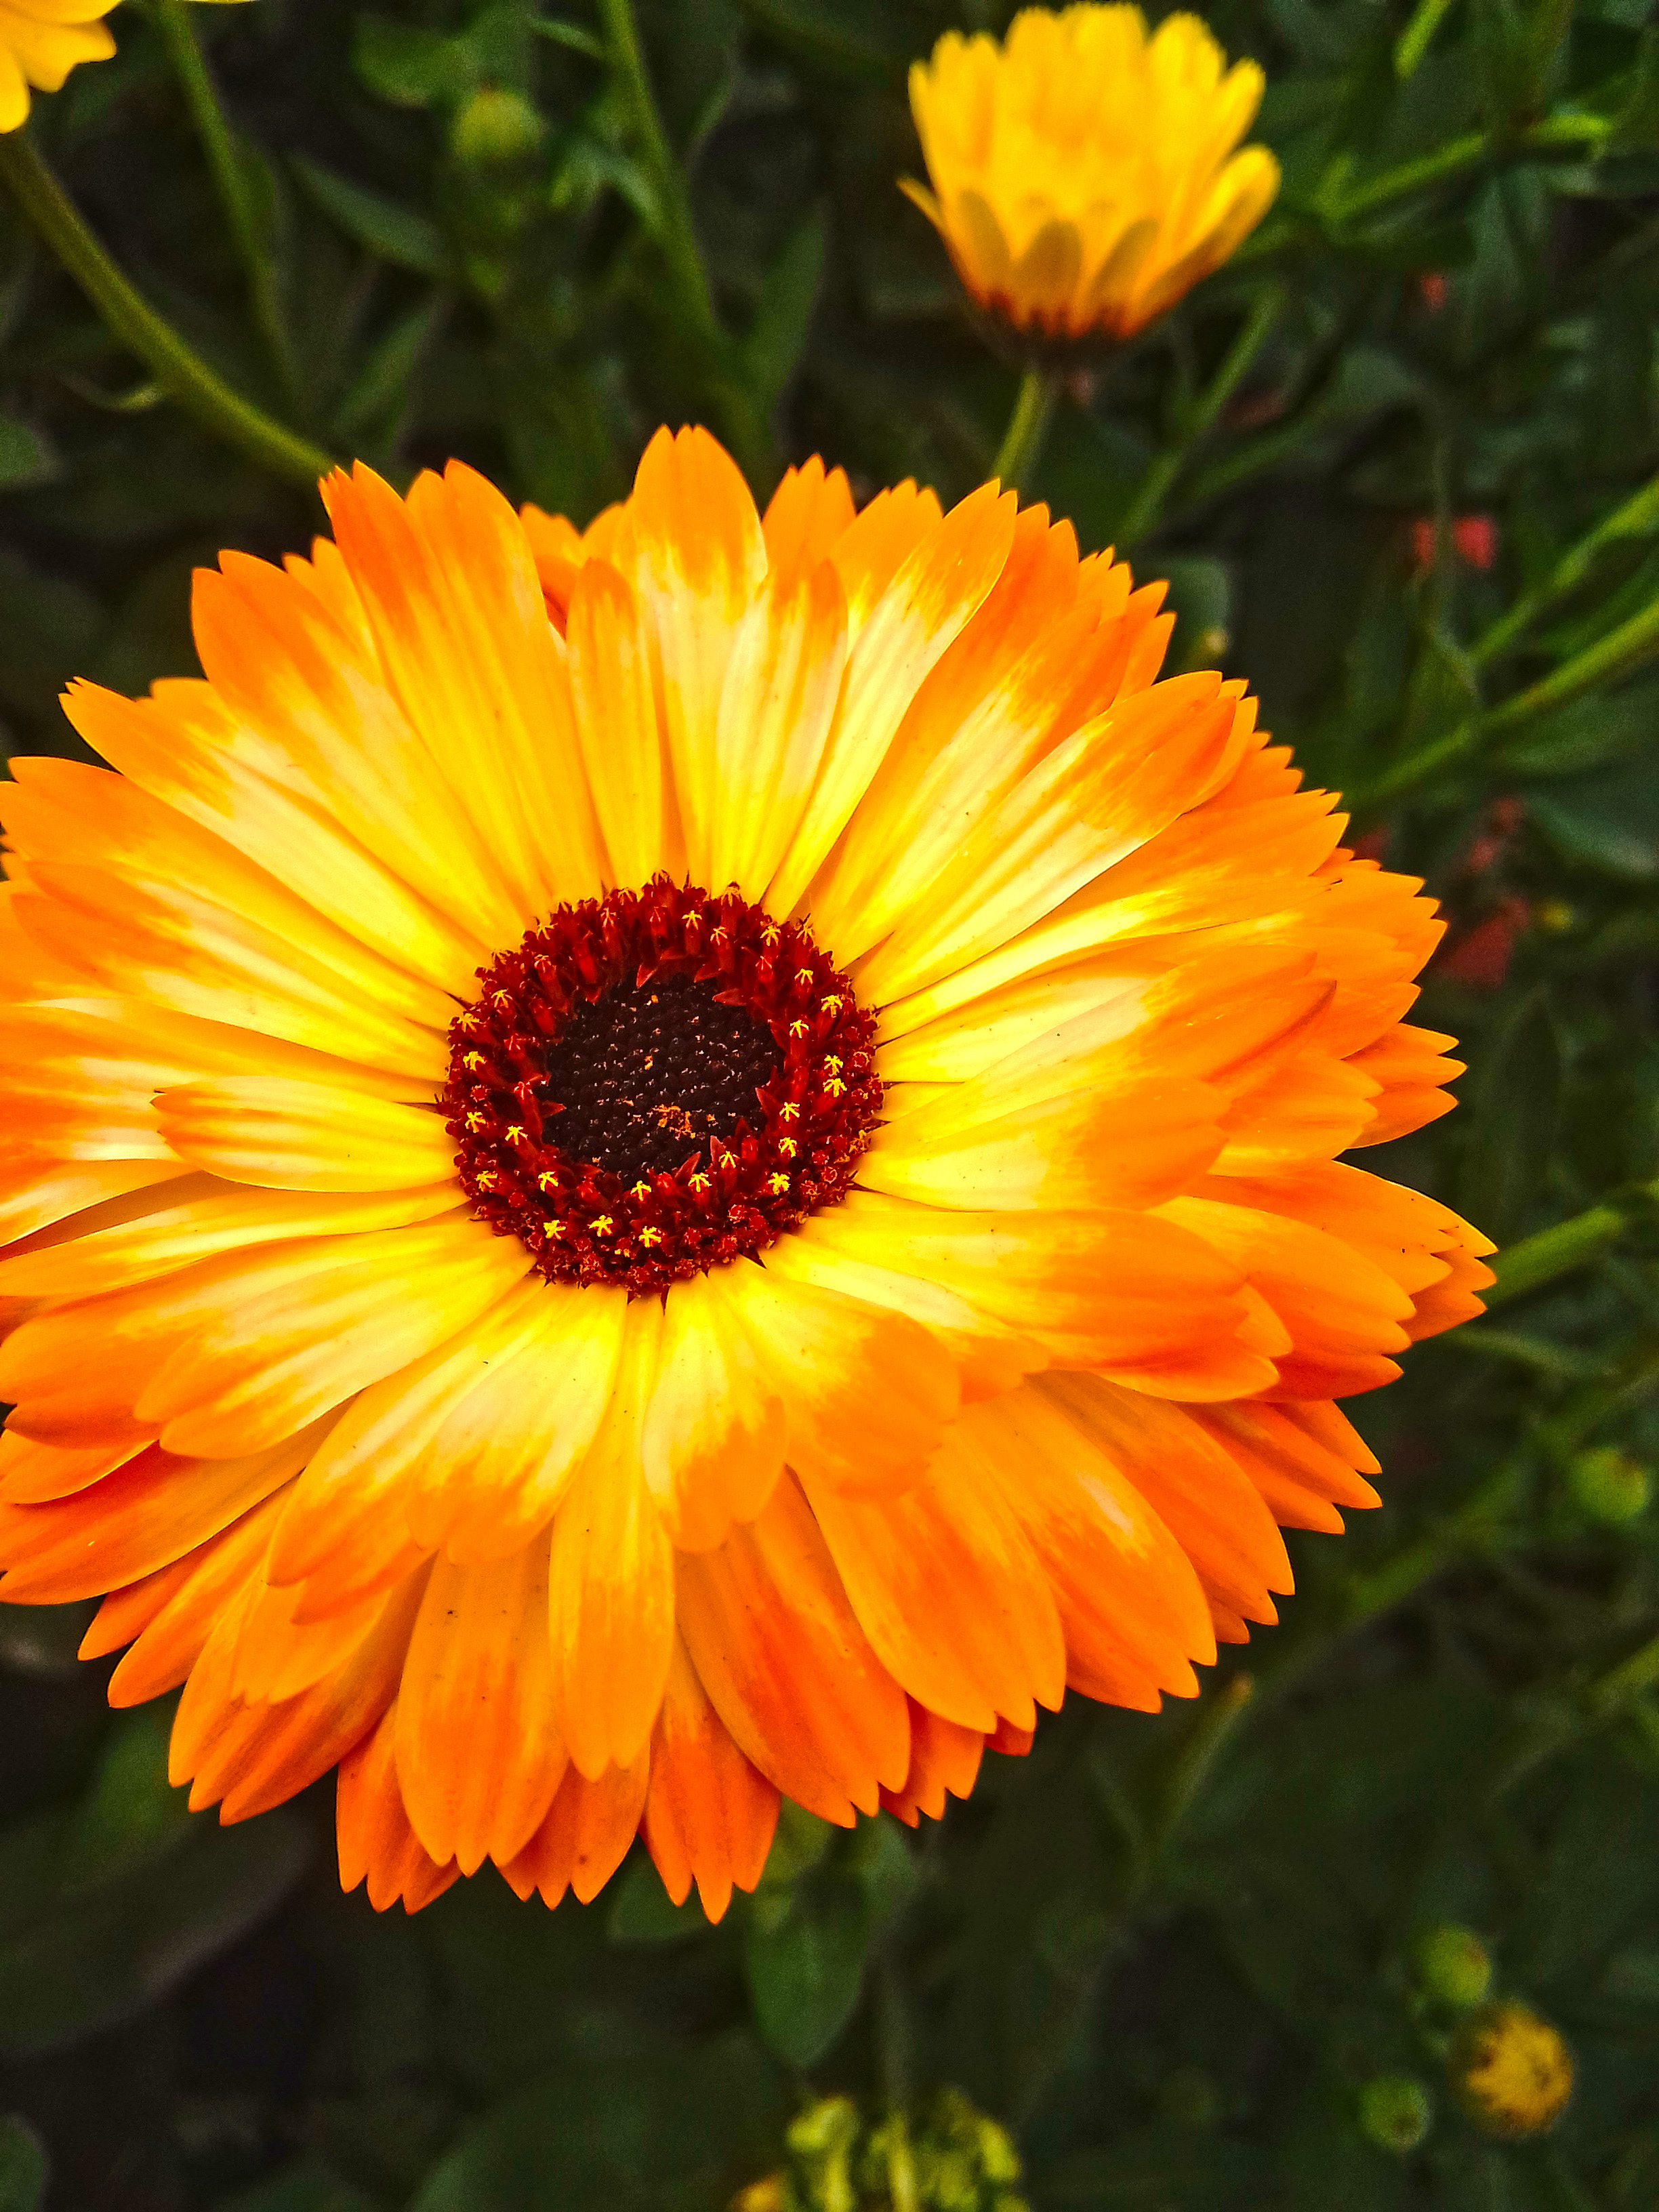 Photography of Pot Marigold flower